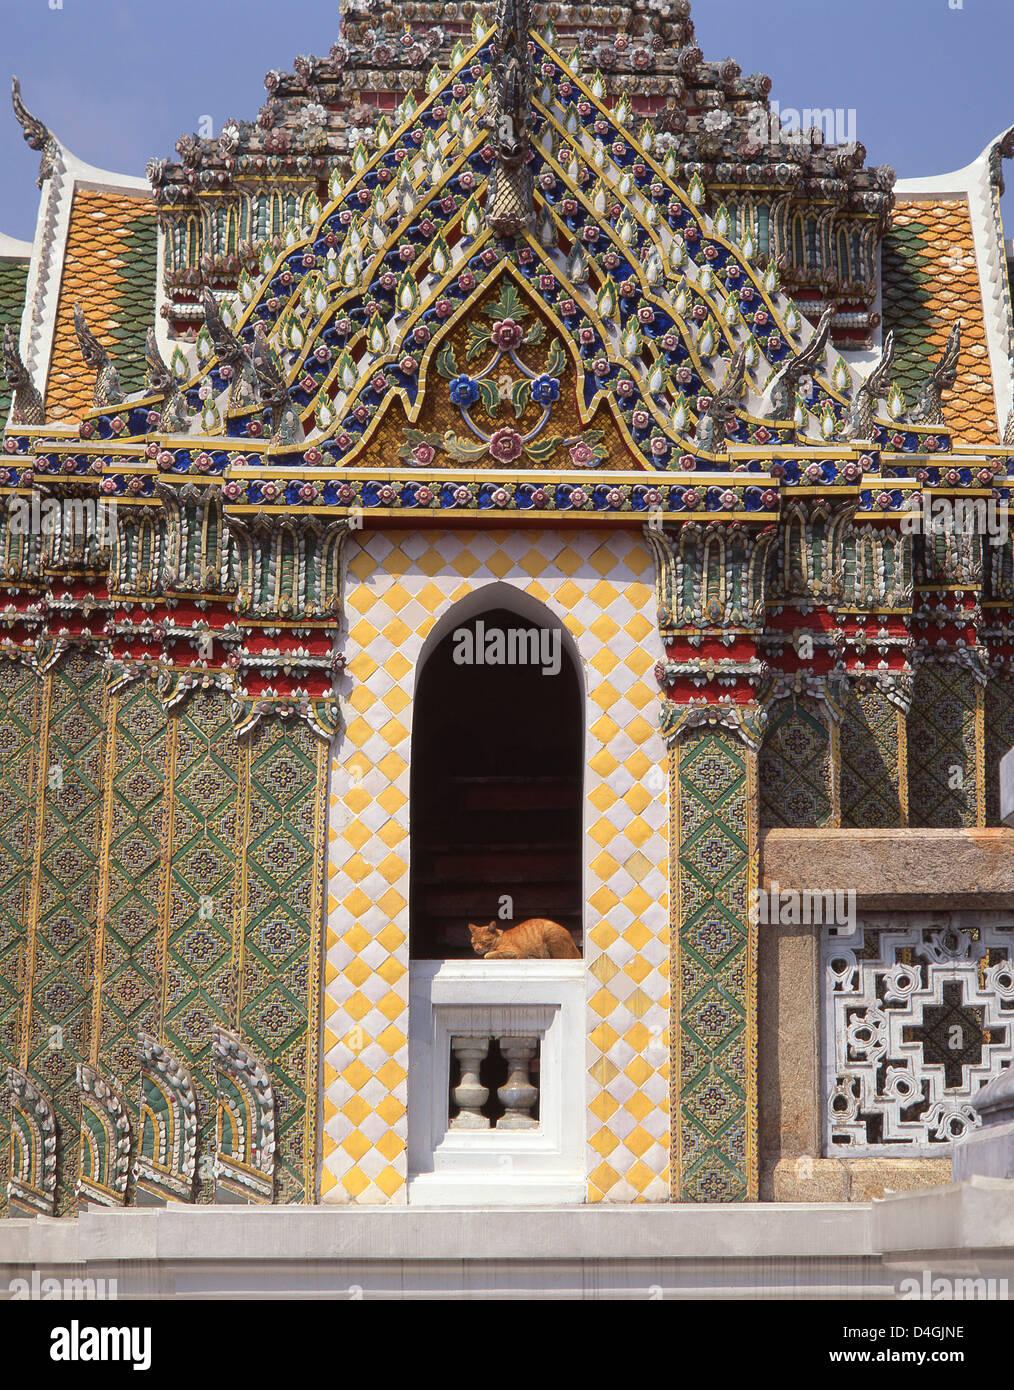 Cat resting at temple, Grand Palace, Rattanakosin Island, Phra Nakhon District, Bangkok, Thailand Stock Photo